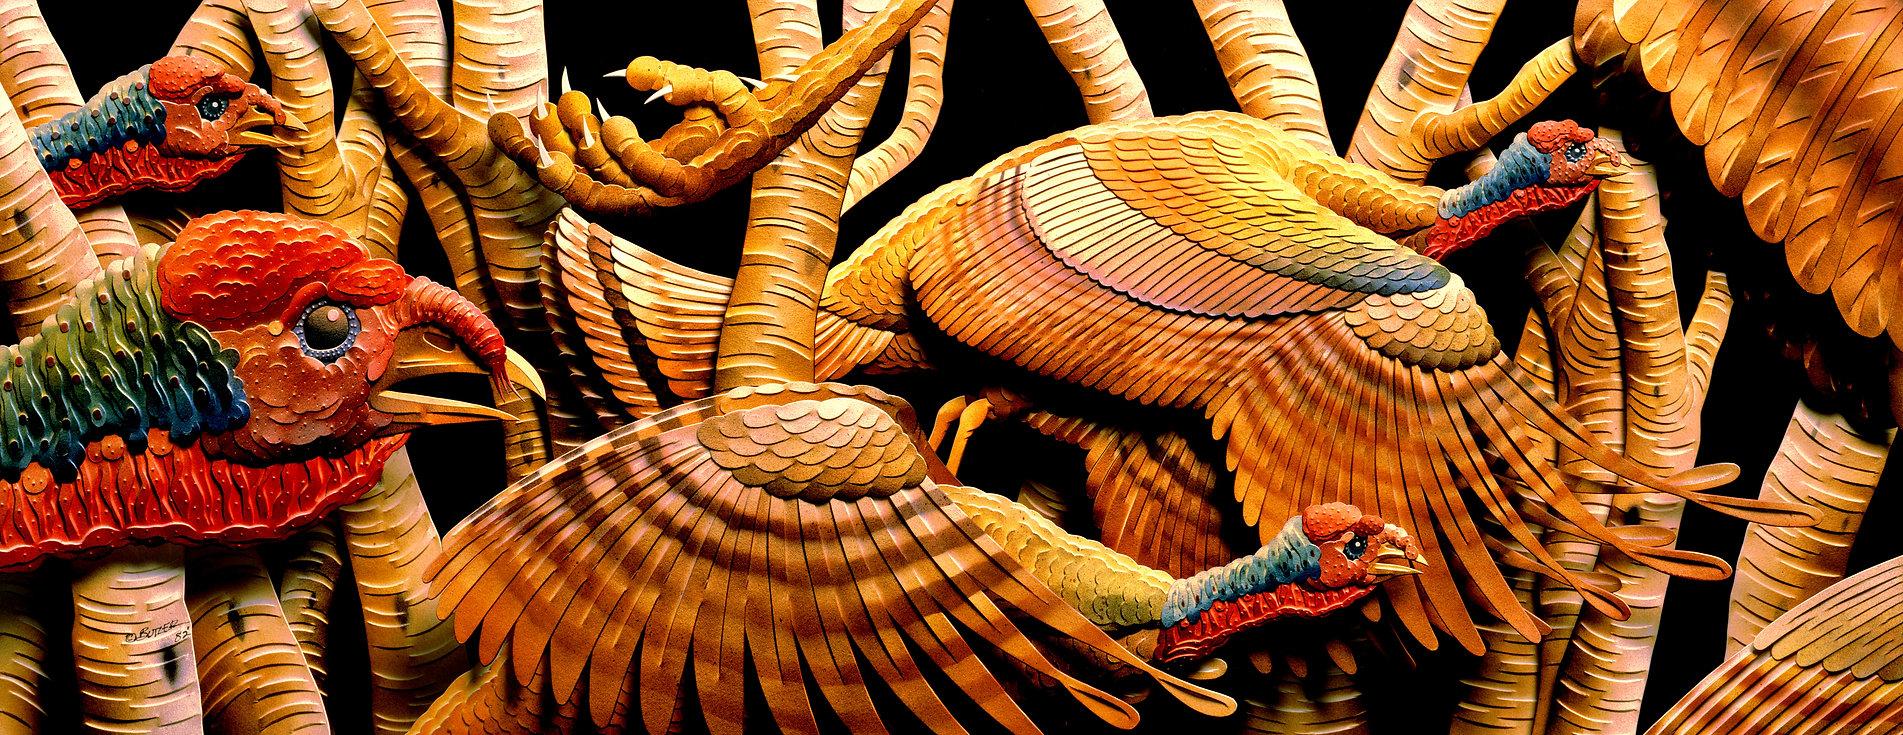 birds-Turkies-a-jp.jpeg